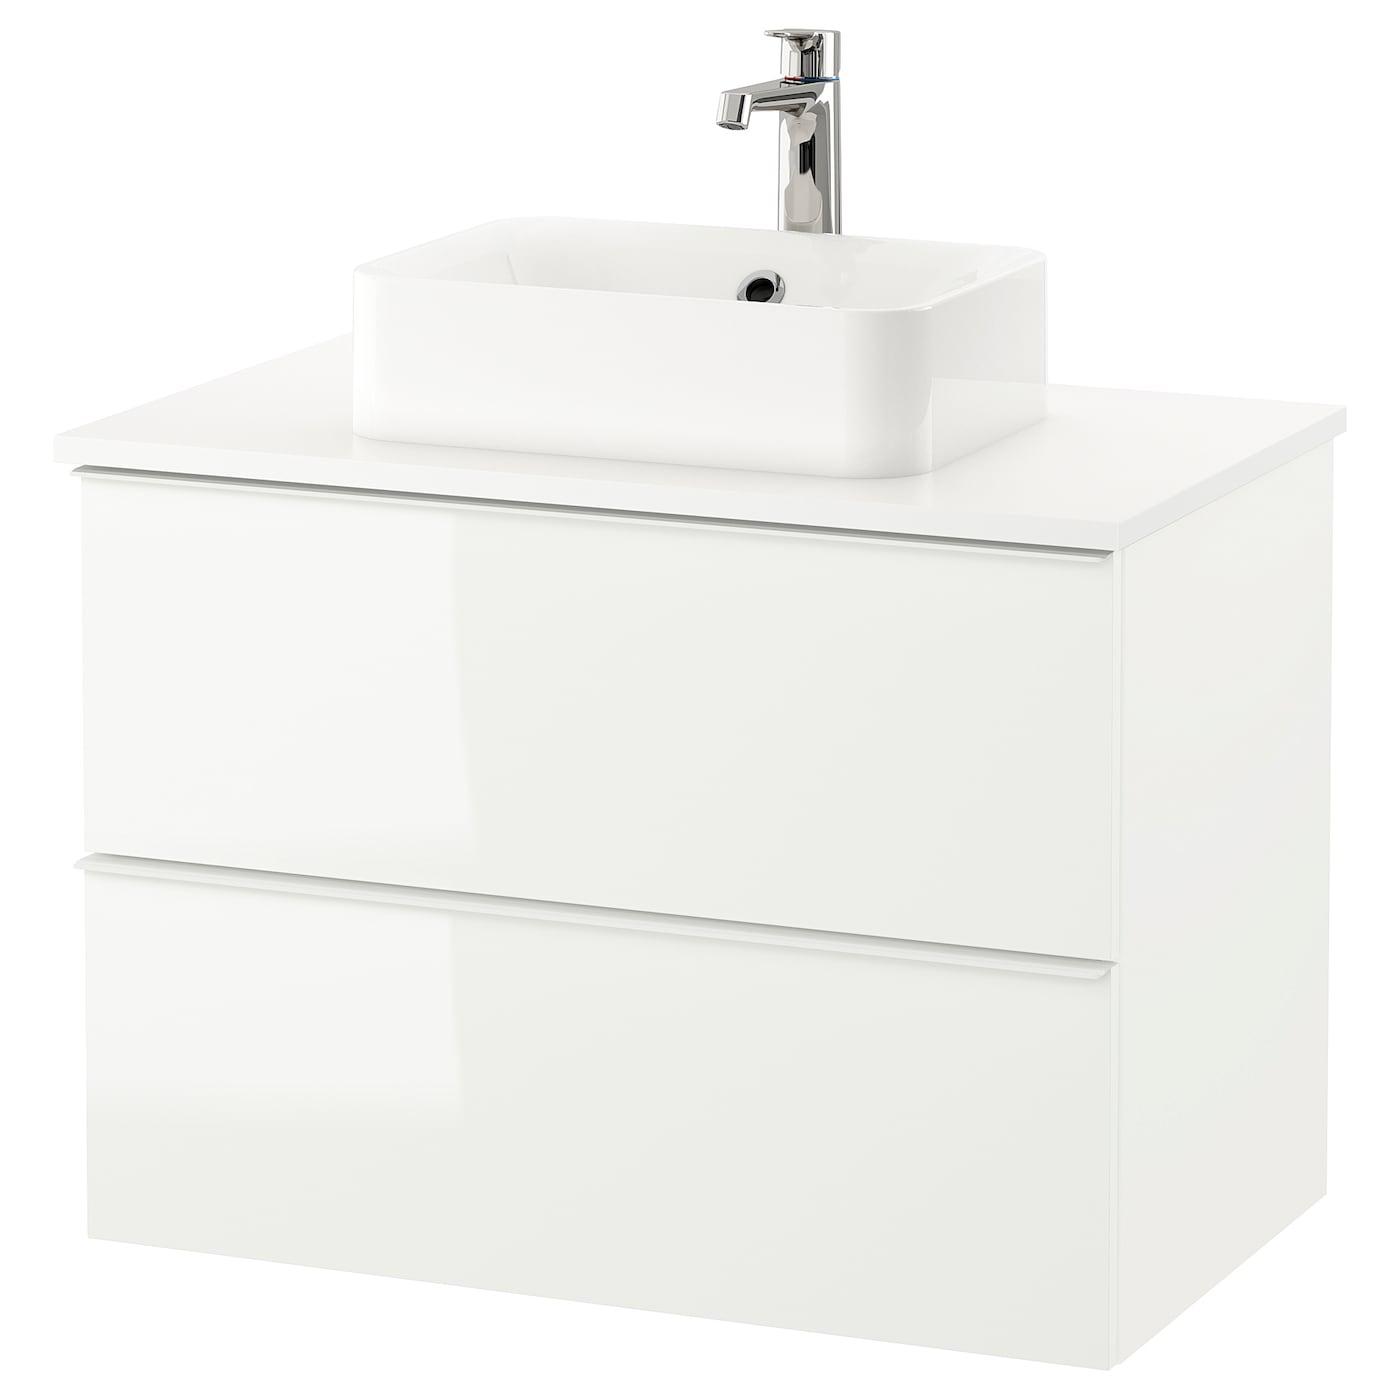 Feuille Stratifié Blanc Brillant godmorgon/tolken / hÖrvik meuble lavabo av lav à poser 45x32 - brillant  blanc, blanc mitigeur lavabo brogrund 82x49x72 cm